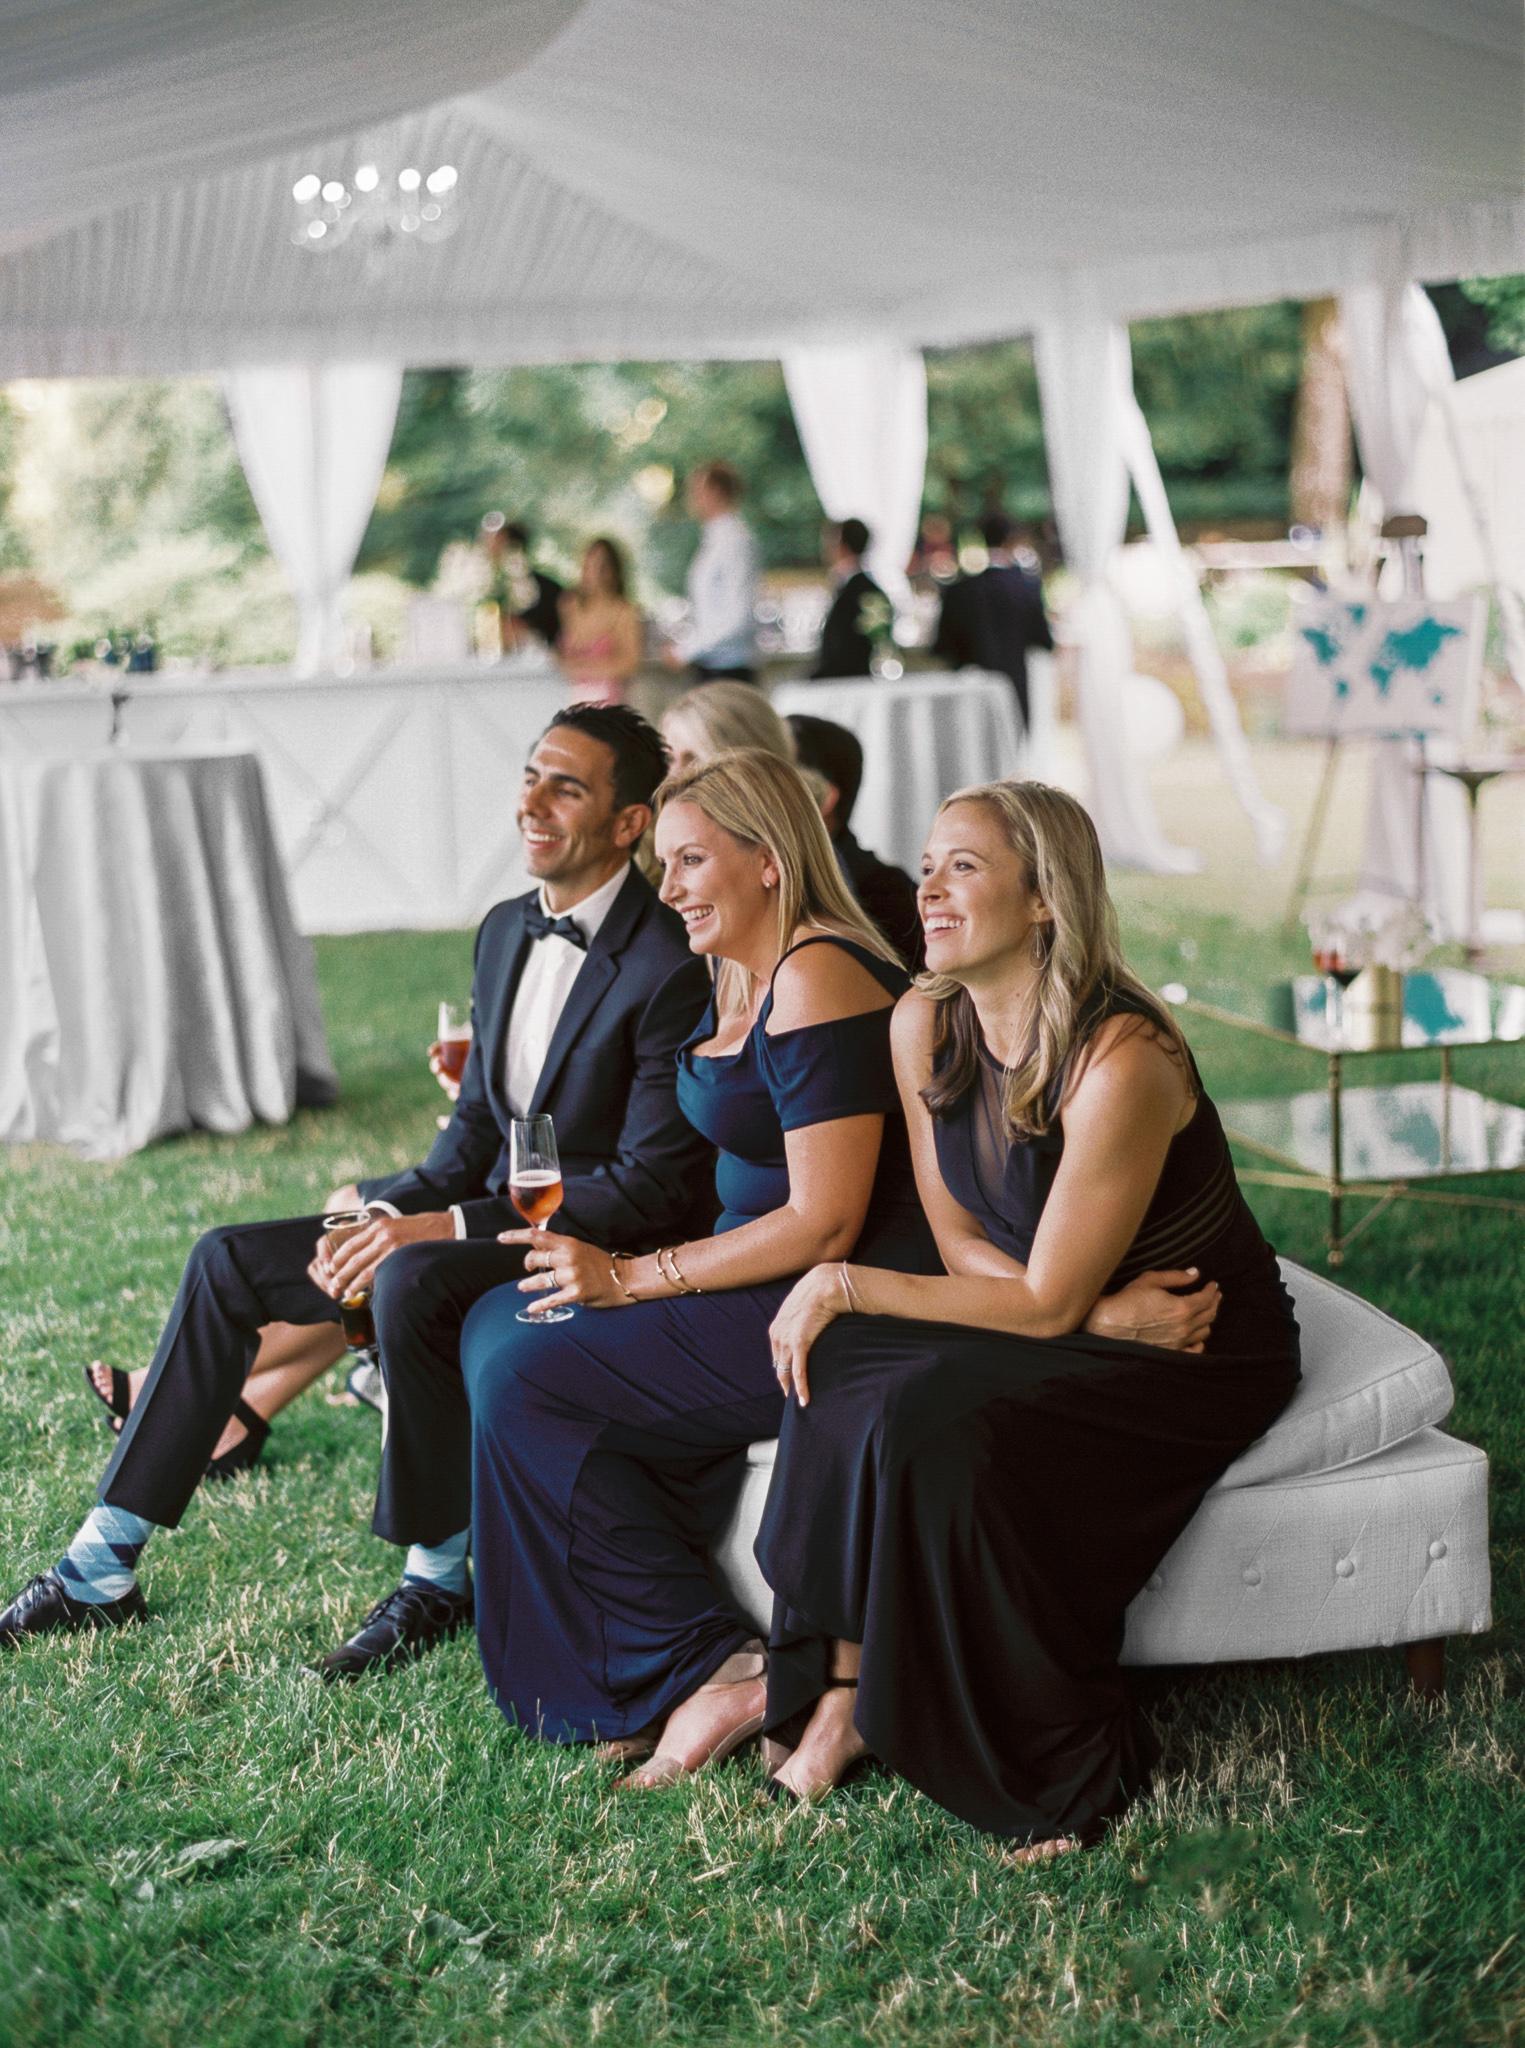 206OutliveCreative_Travel_Photographer_Videographer_Lewis&Clark_Oregon_Elegant_BlackTie_Destination_Wedding.jpg